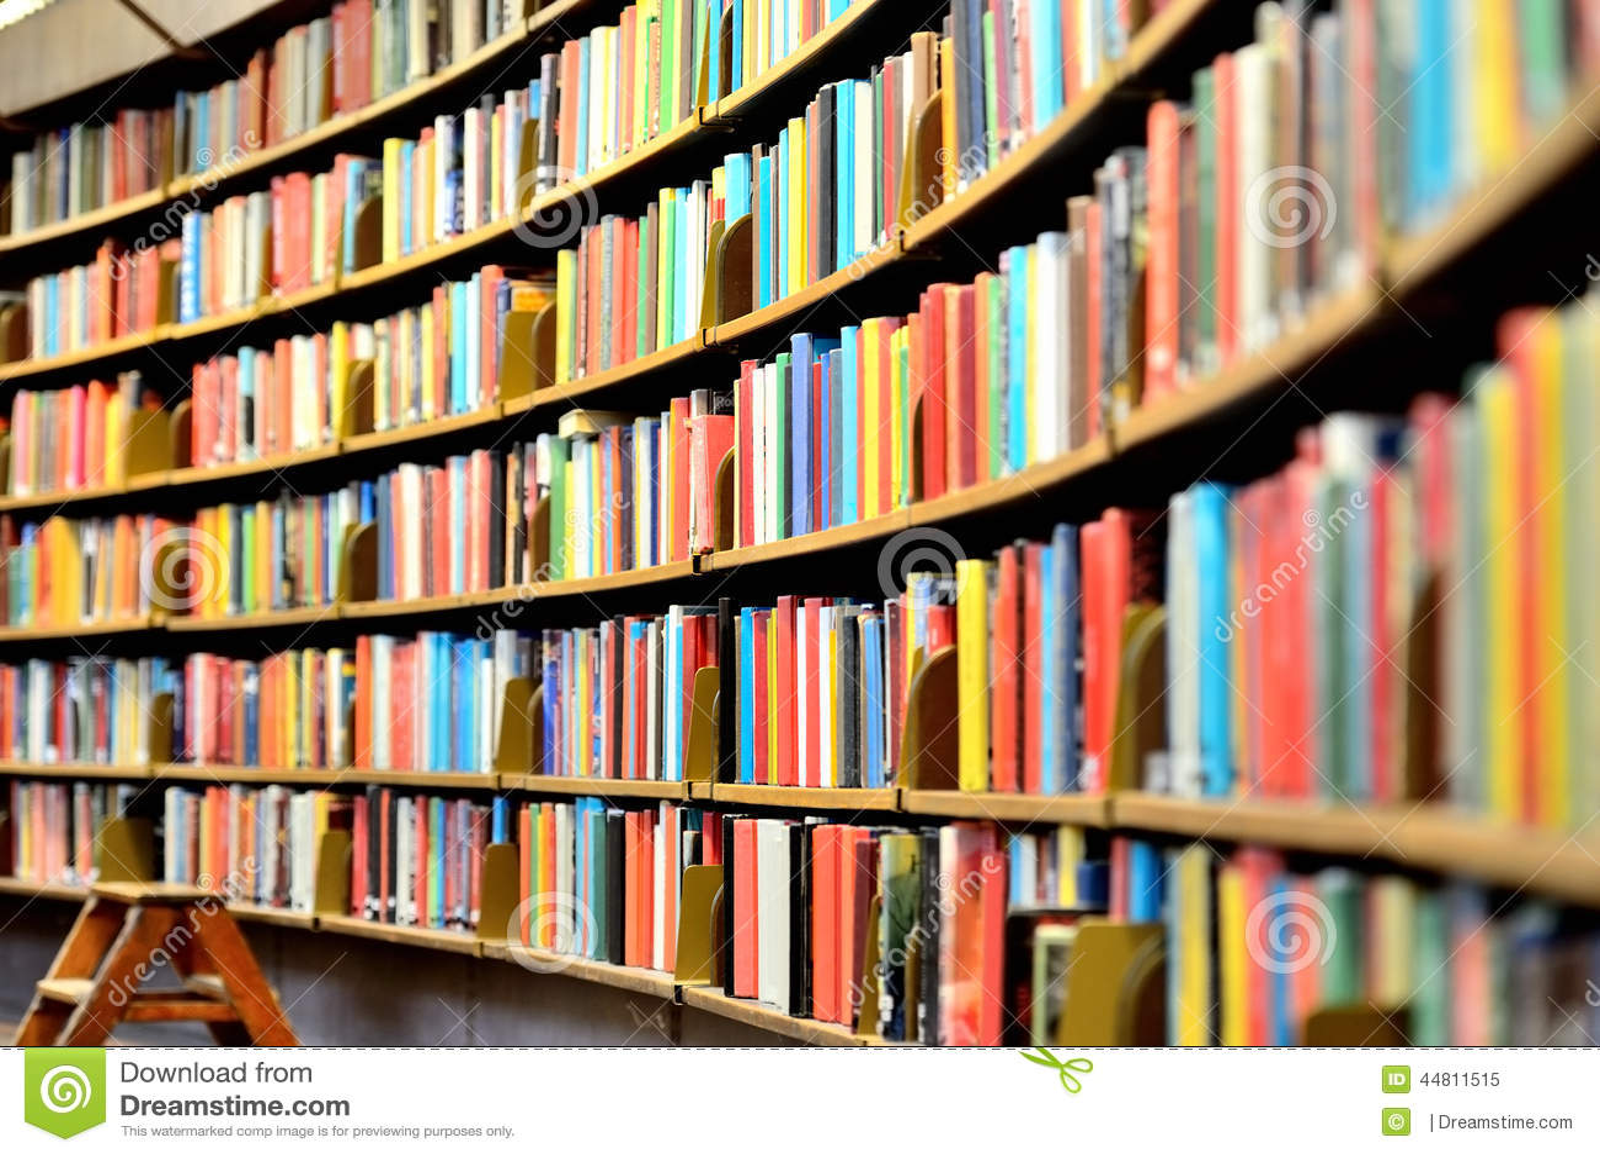 Public library bookshelf Round bookshelf in public